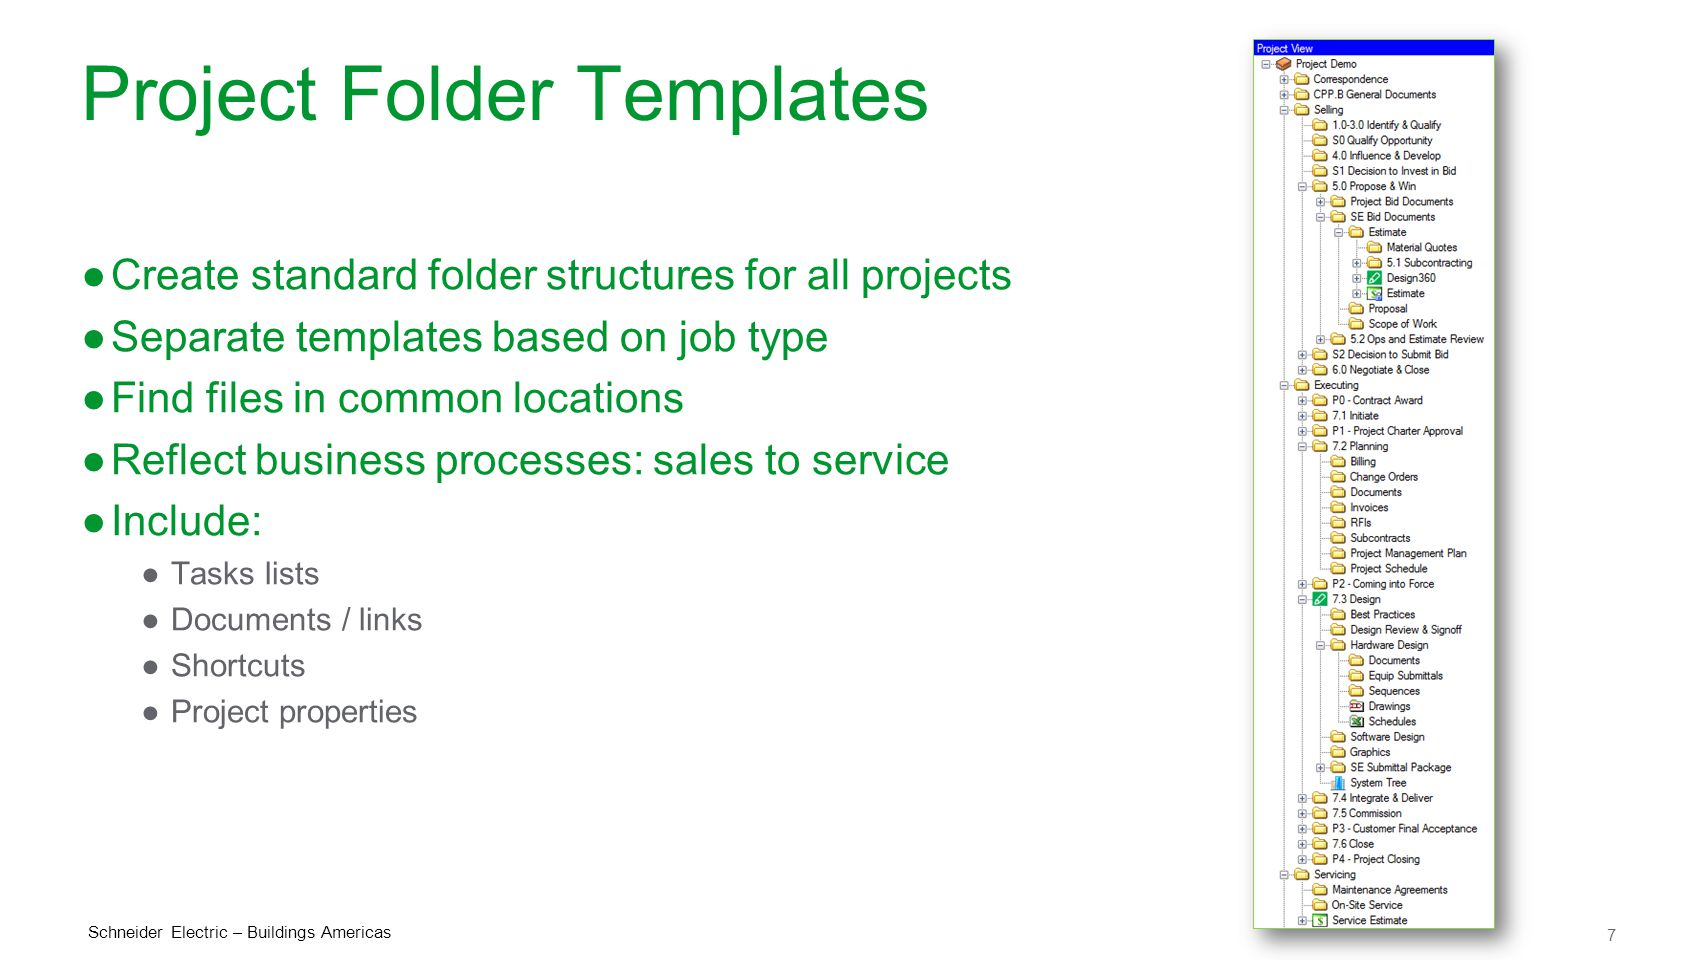 Project Folder Templates